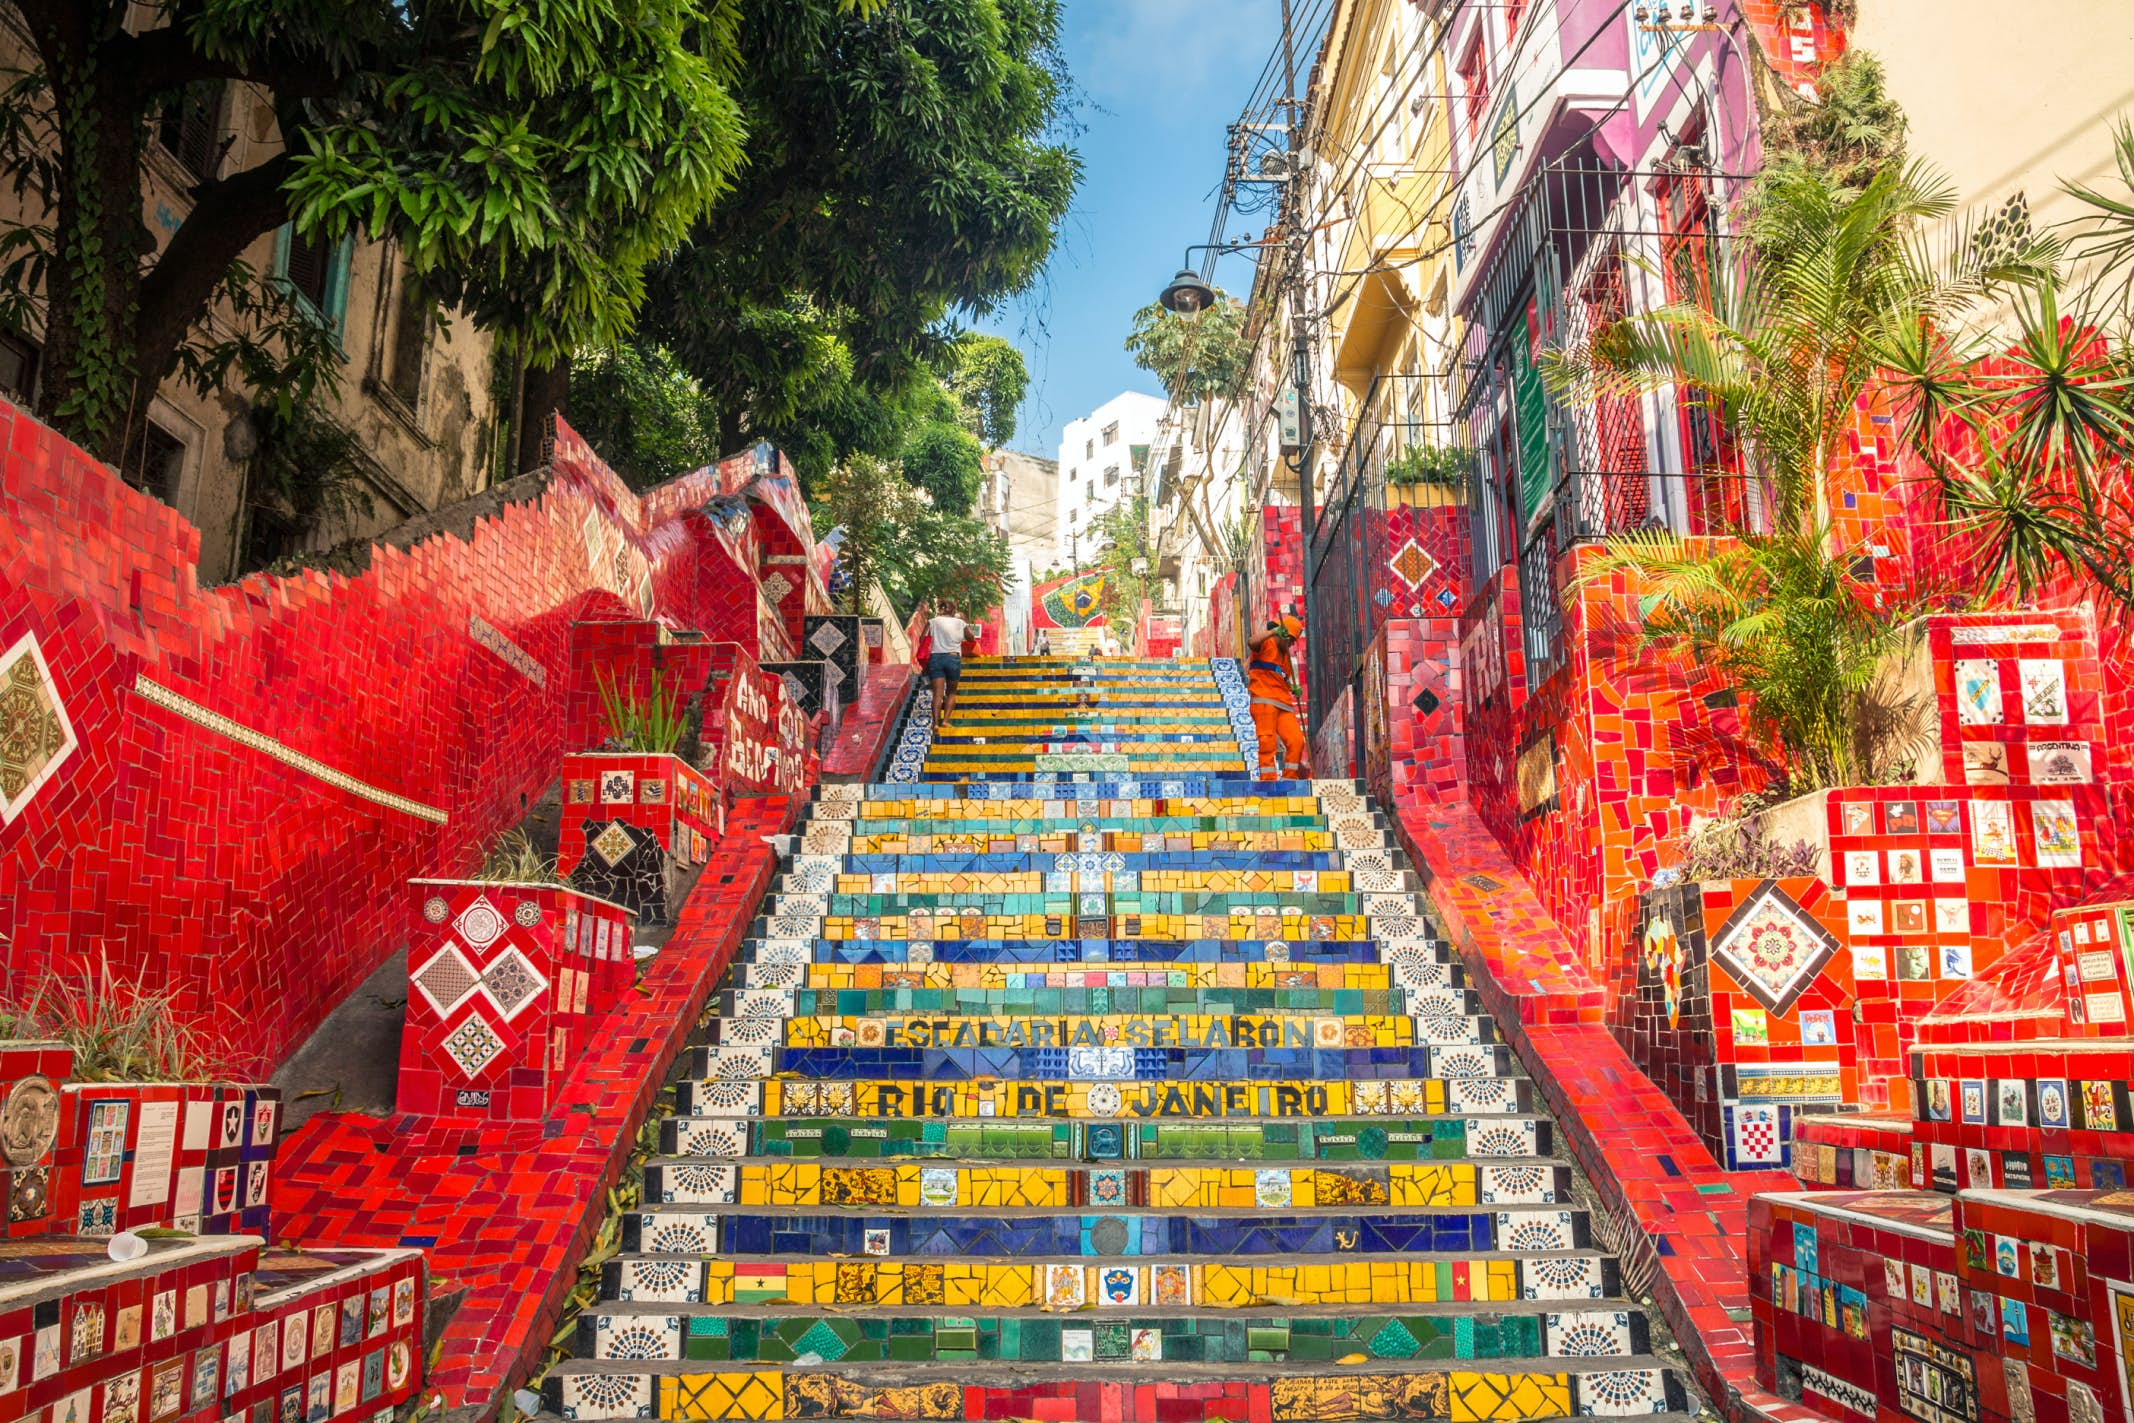 Escadaria Selarón | Rio de Janeiro, Brazil Attractions - Lonely Planet